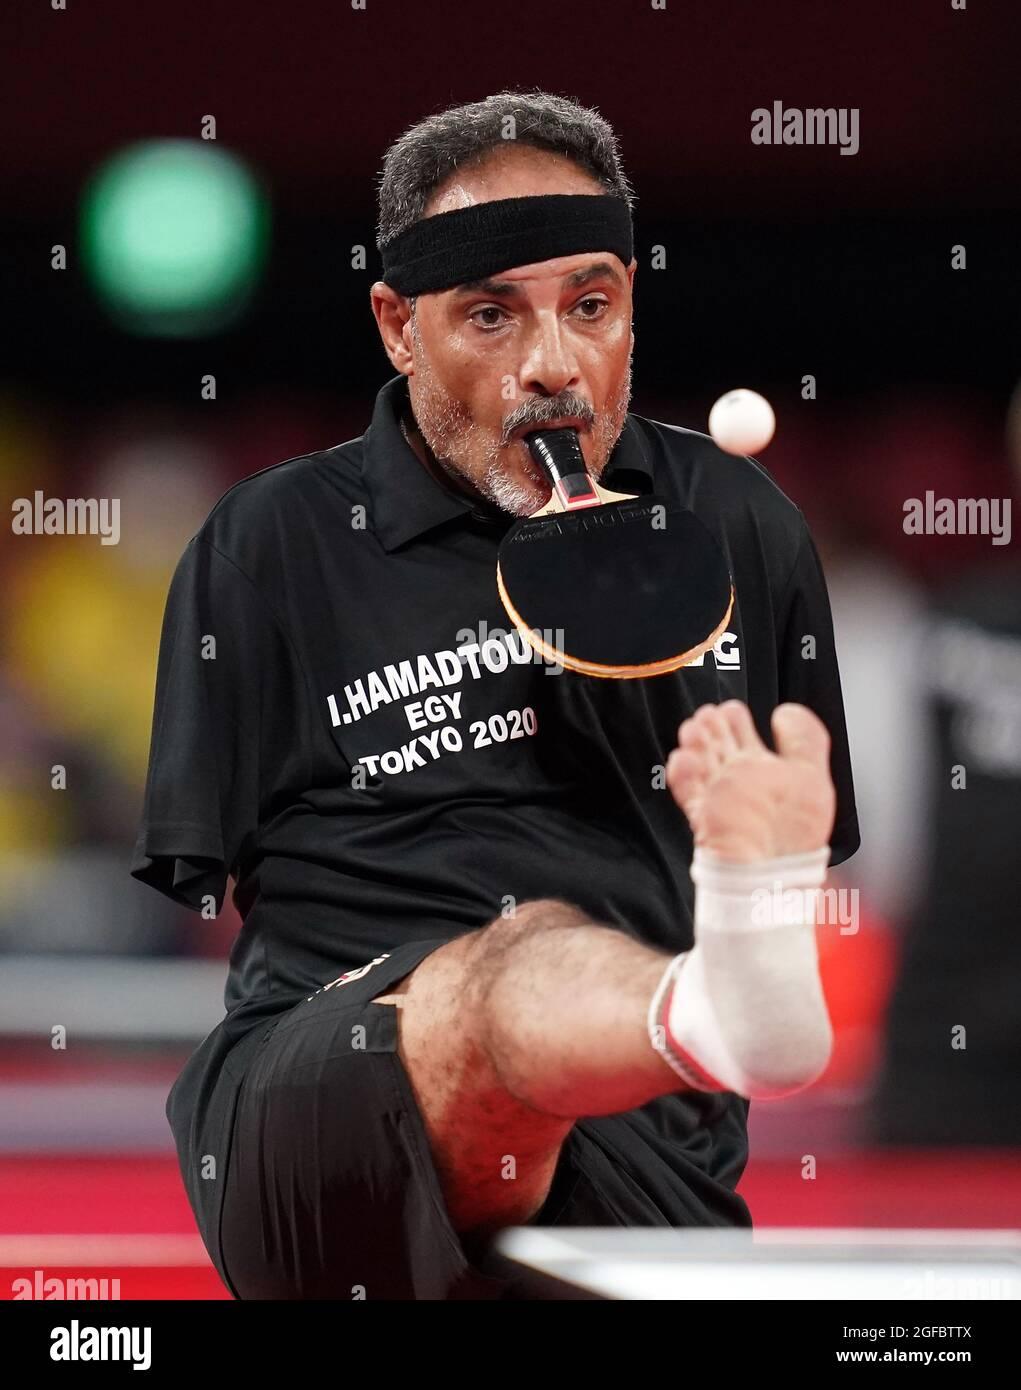 Ibrahim Elhusseiny Hamadtou in azione nel Men's Singles Class 6 Group e Table Tennis al Tokyo Metropolitan Gymnasium il giorno uno dei Tokyo 2020 Paralimpic Games in Giappone. Data foto: Mercoledì 25 agosto 2021. Foto Stock